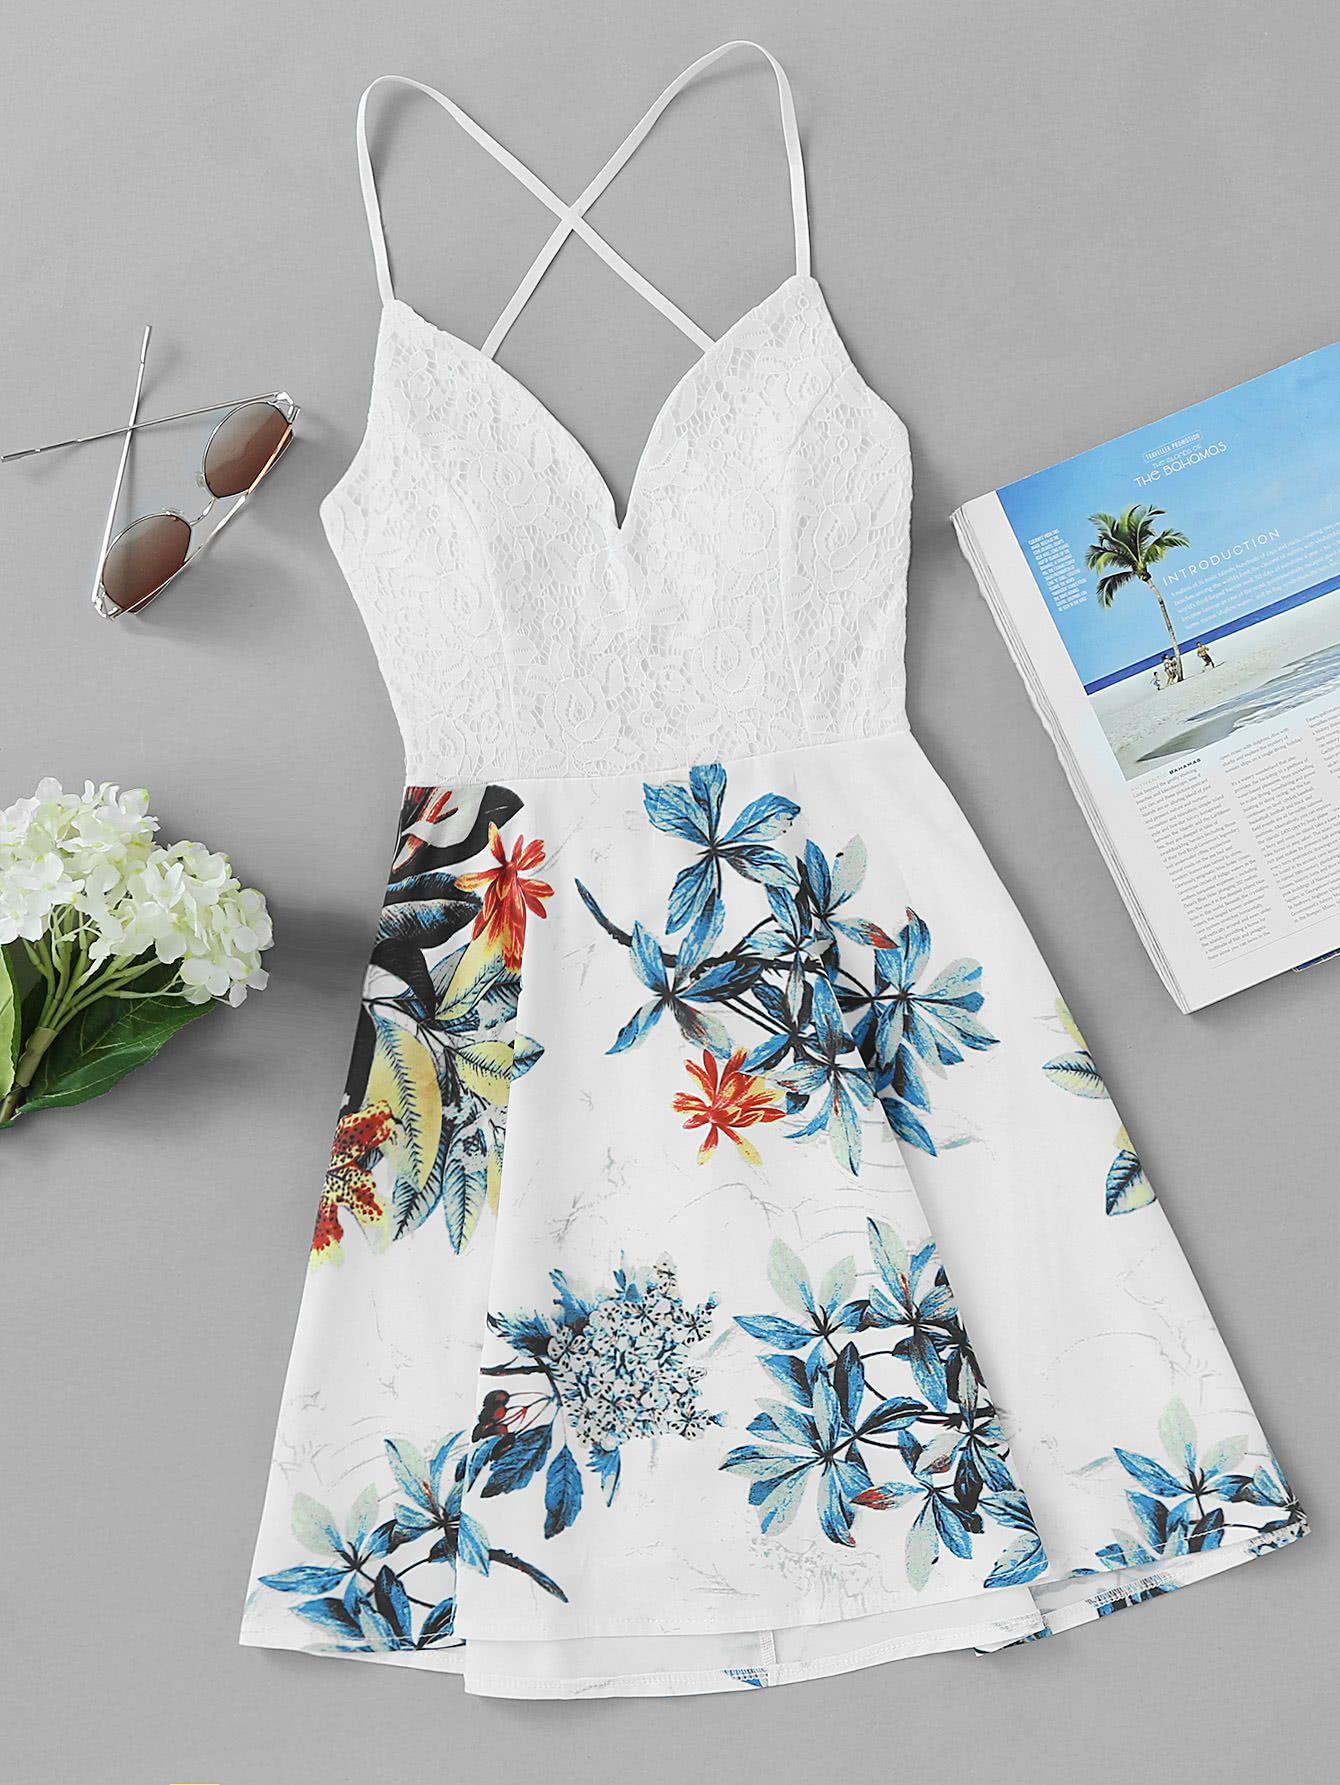 5cf9acf5a78c ... Neck Sleeveless Dress Boho. Criss Cross Back Lace Panel Tropical Print DressFor  Women-romwe